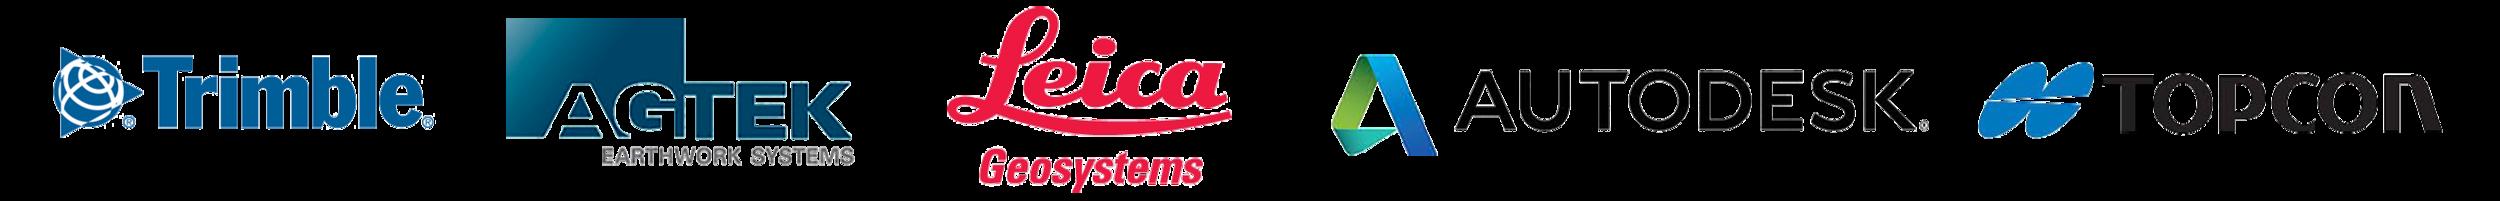 logo strip 5.png